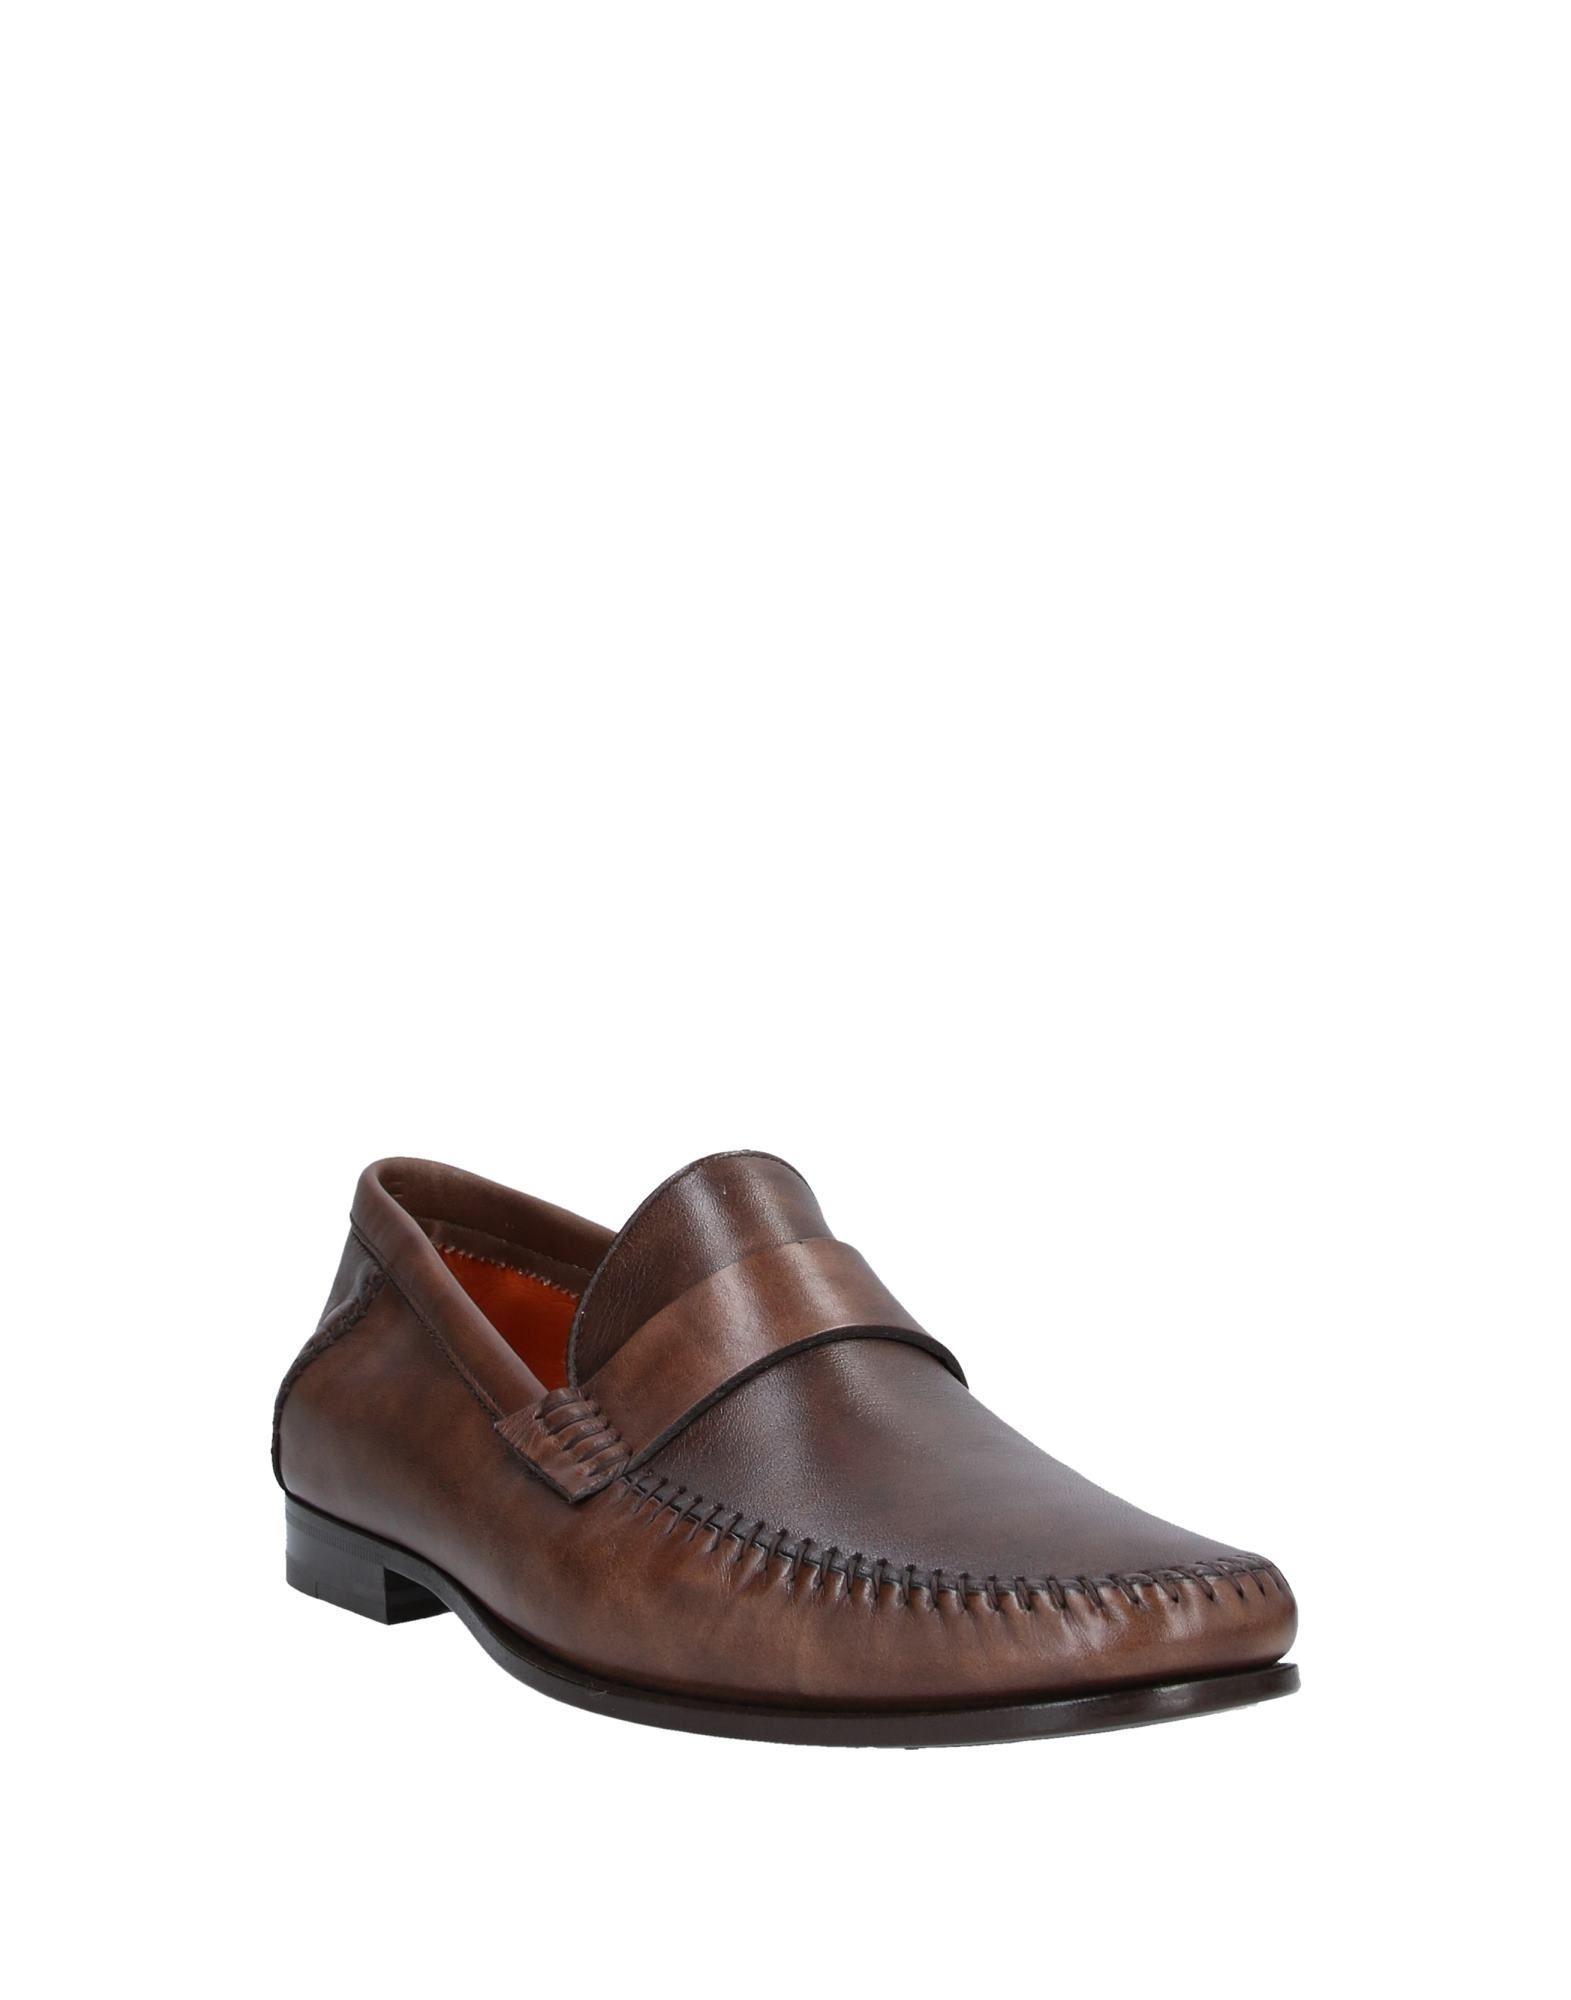 Santoni Dark Brown Leather Loafers